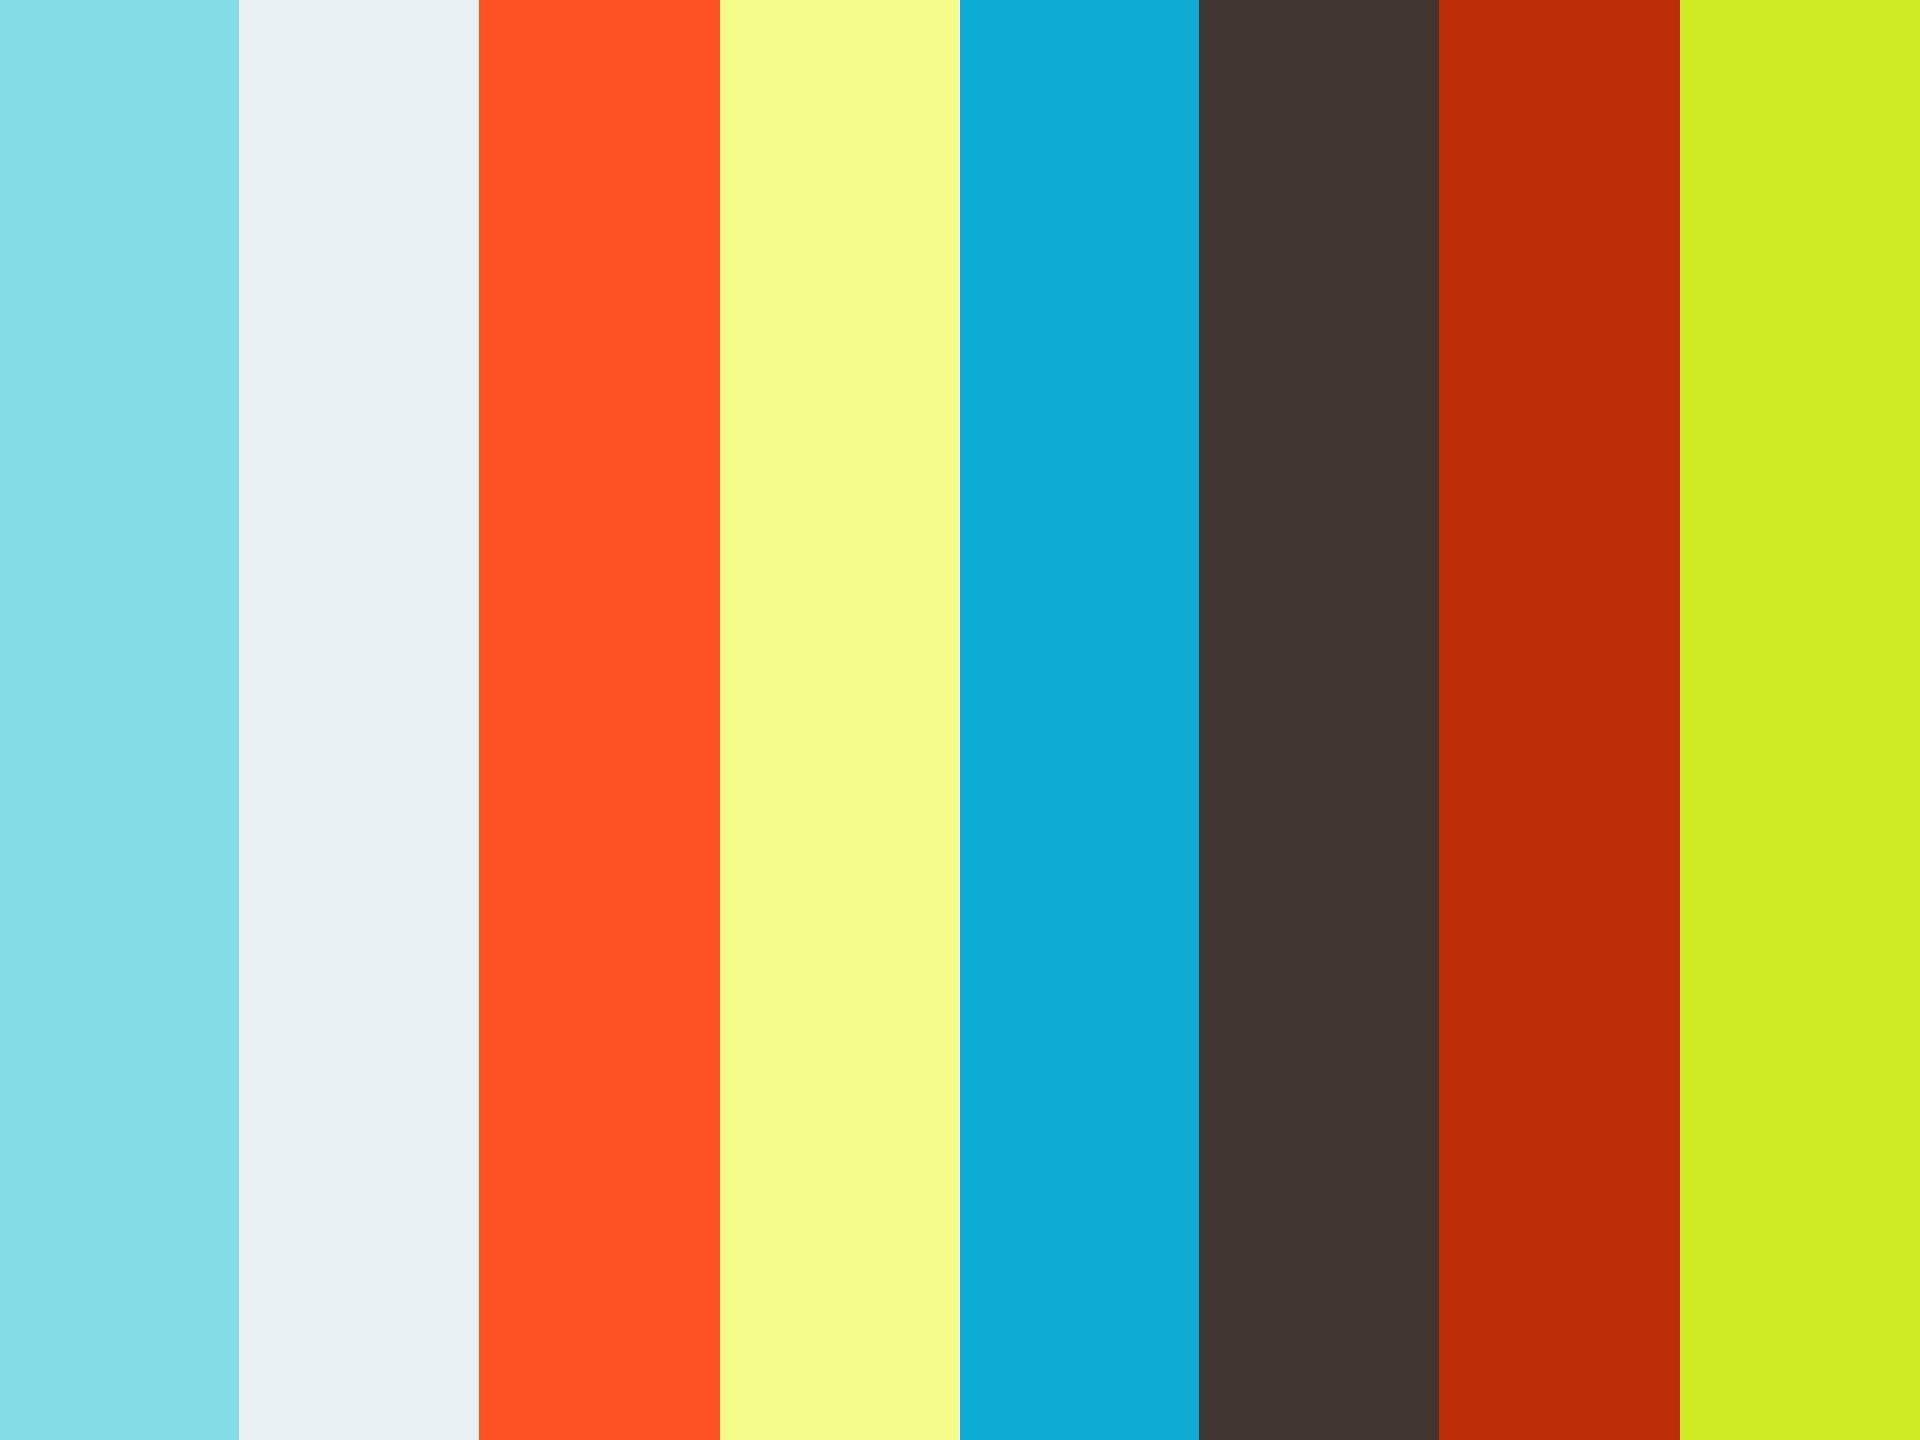 Schwarzkopf | Generation Colour 2021